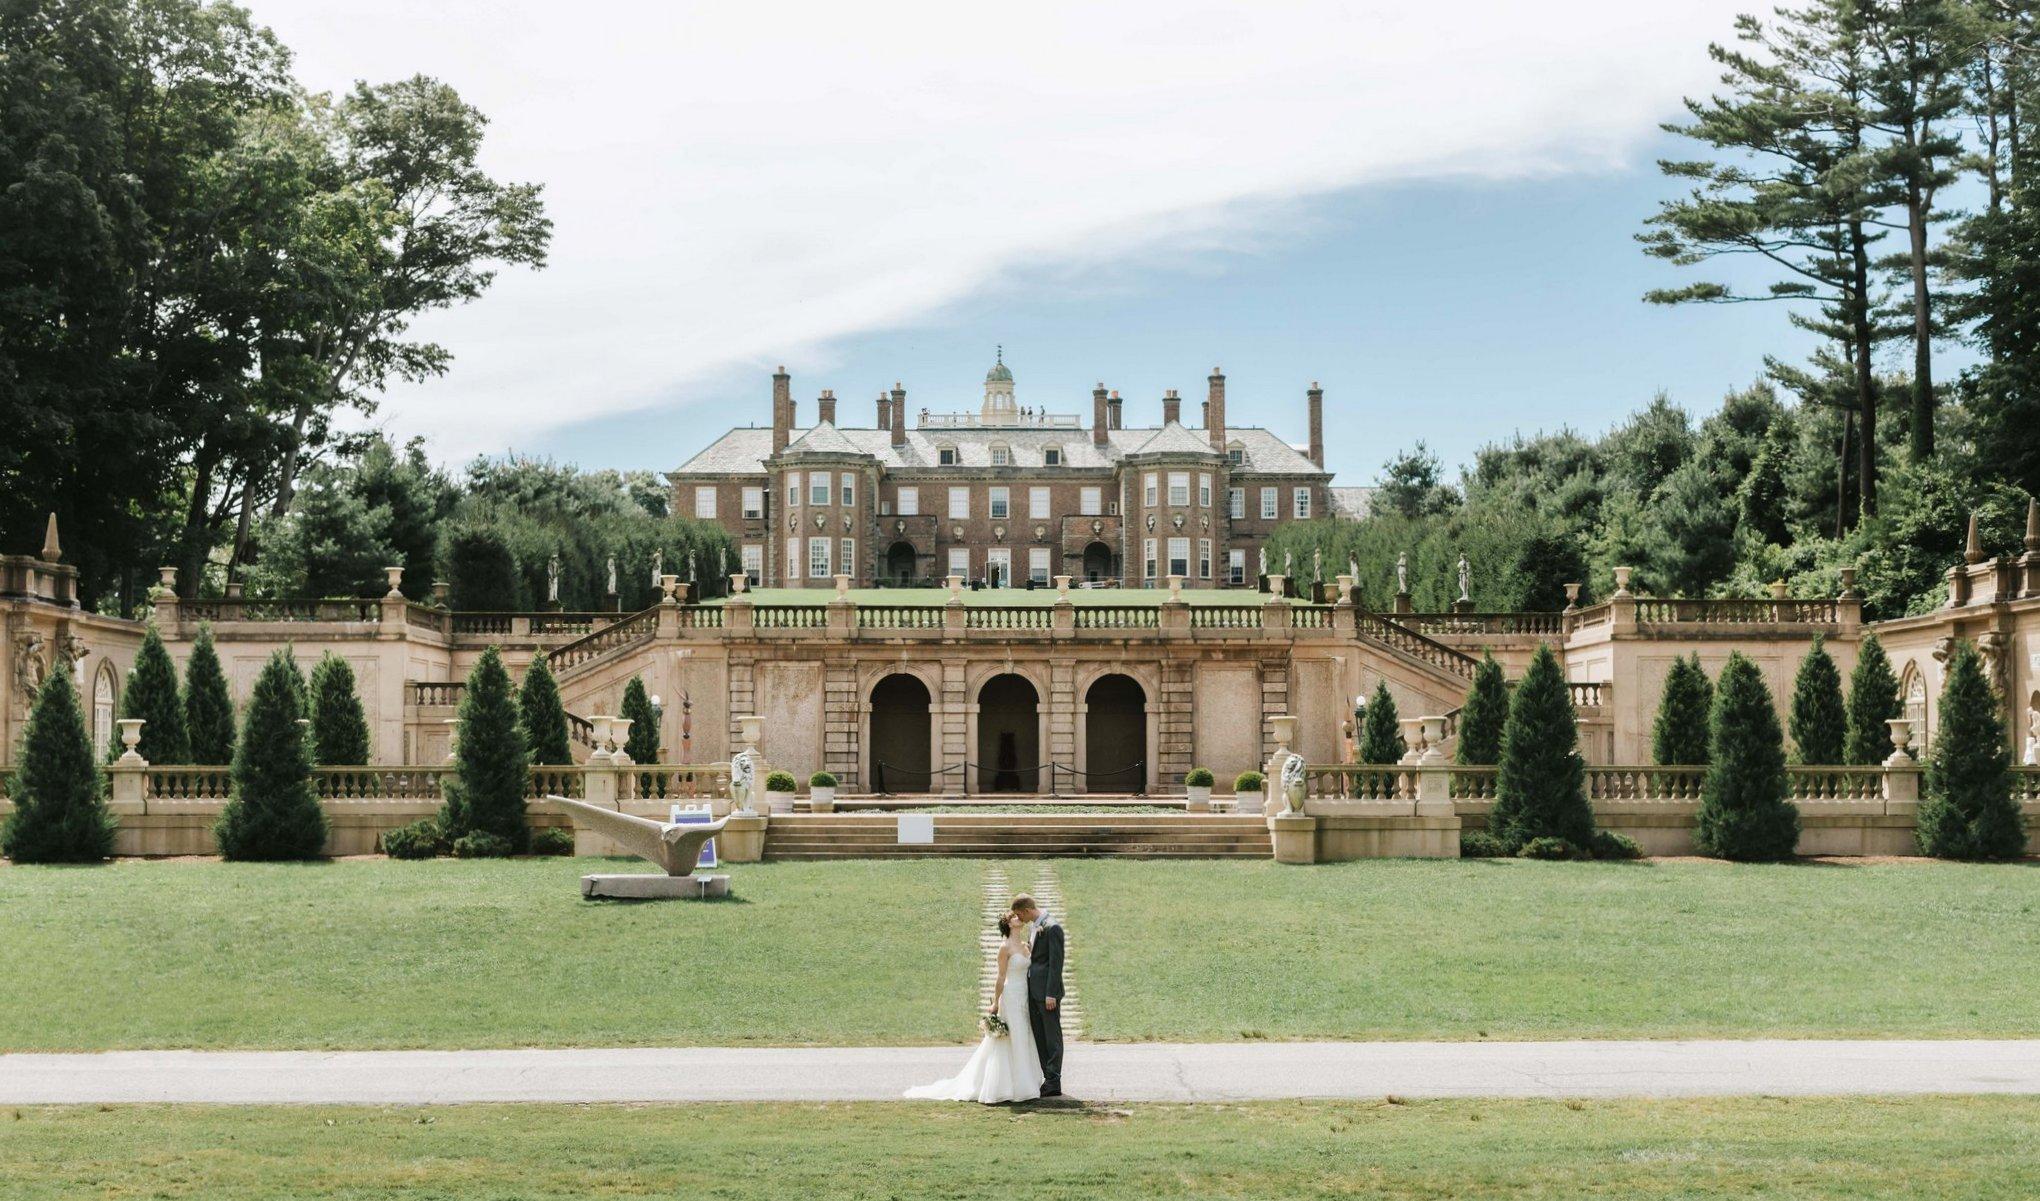 Crane-Estate-Vow-Renewal-Wedding-22.JPG